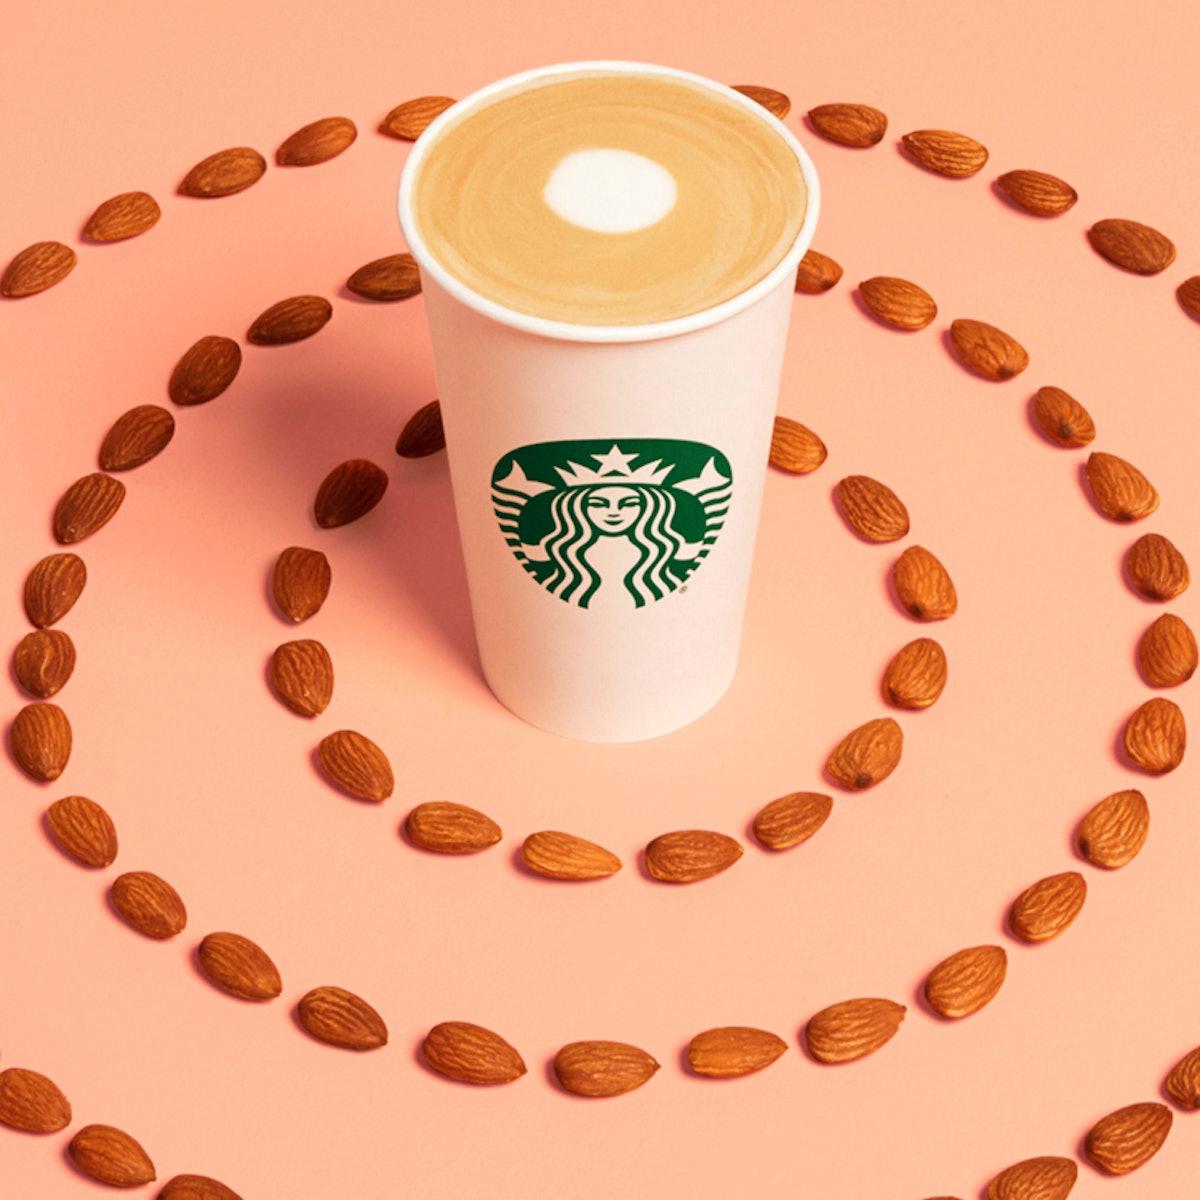 Starbucks' Almondmilk Latte will be available at Starbucks locations nationwide.